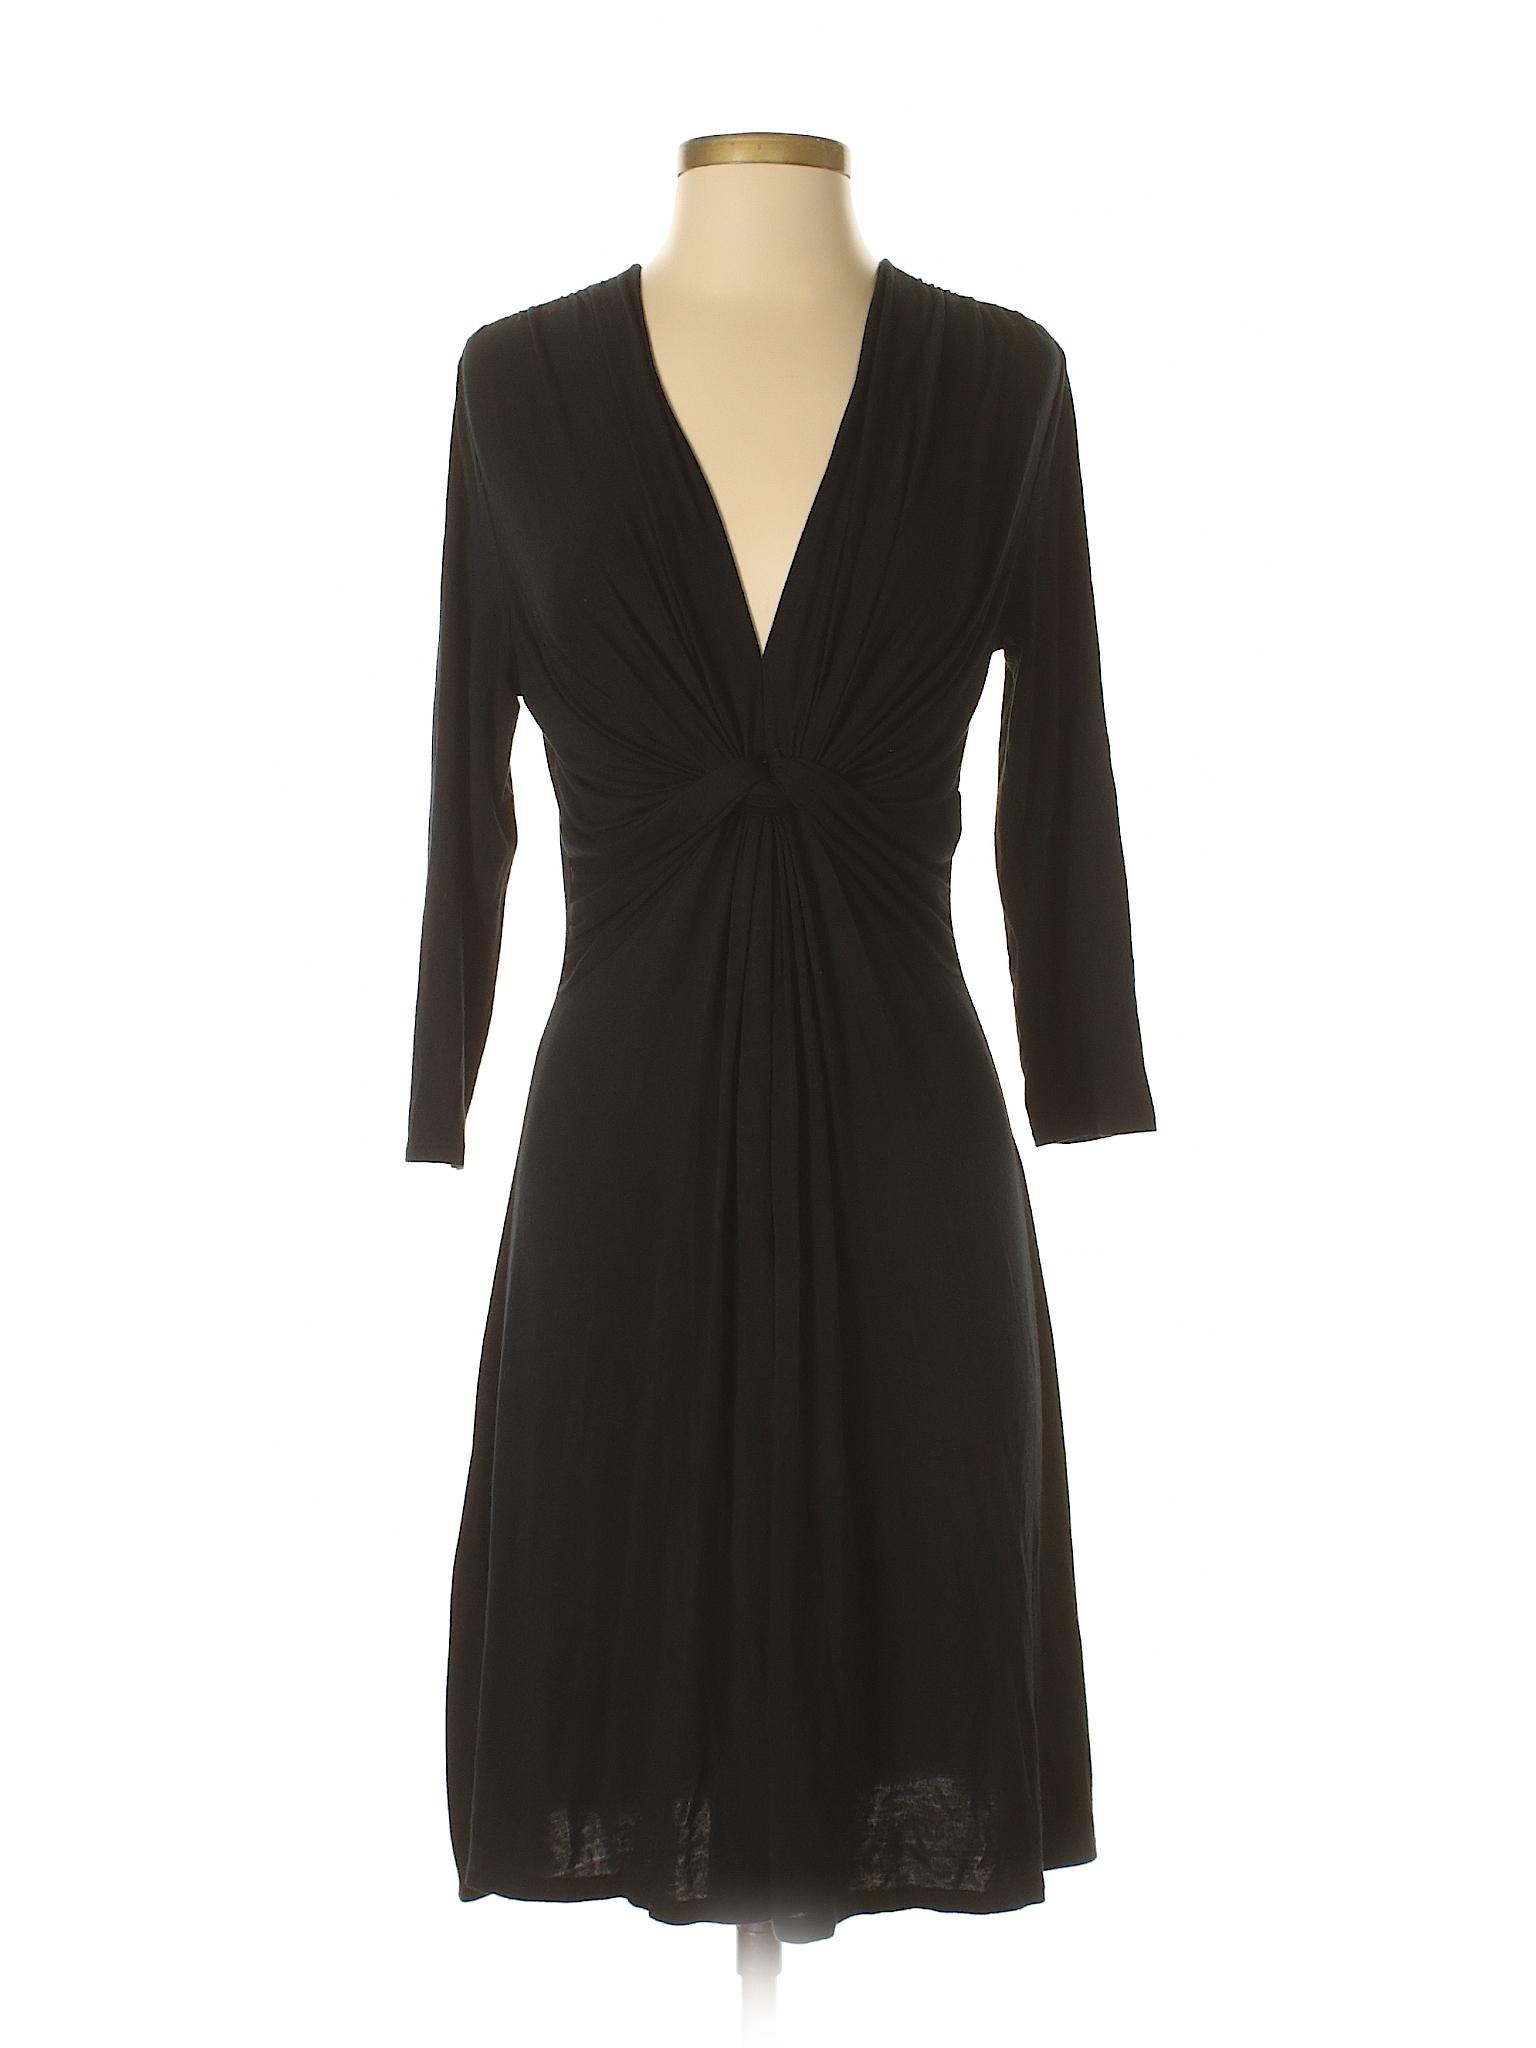 Casual Proper Boutique winter Andrea Boston Behar Dress wXp6Bqvp